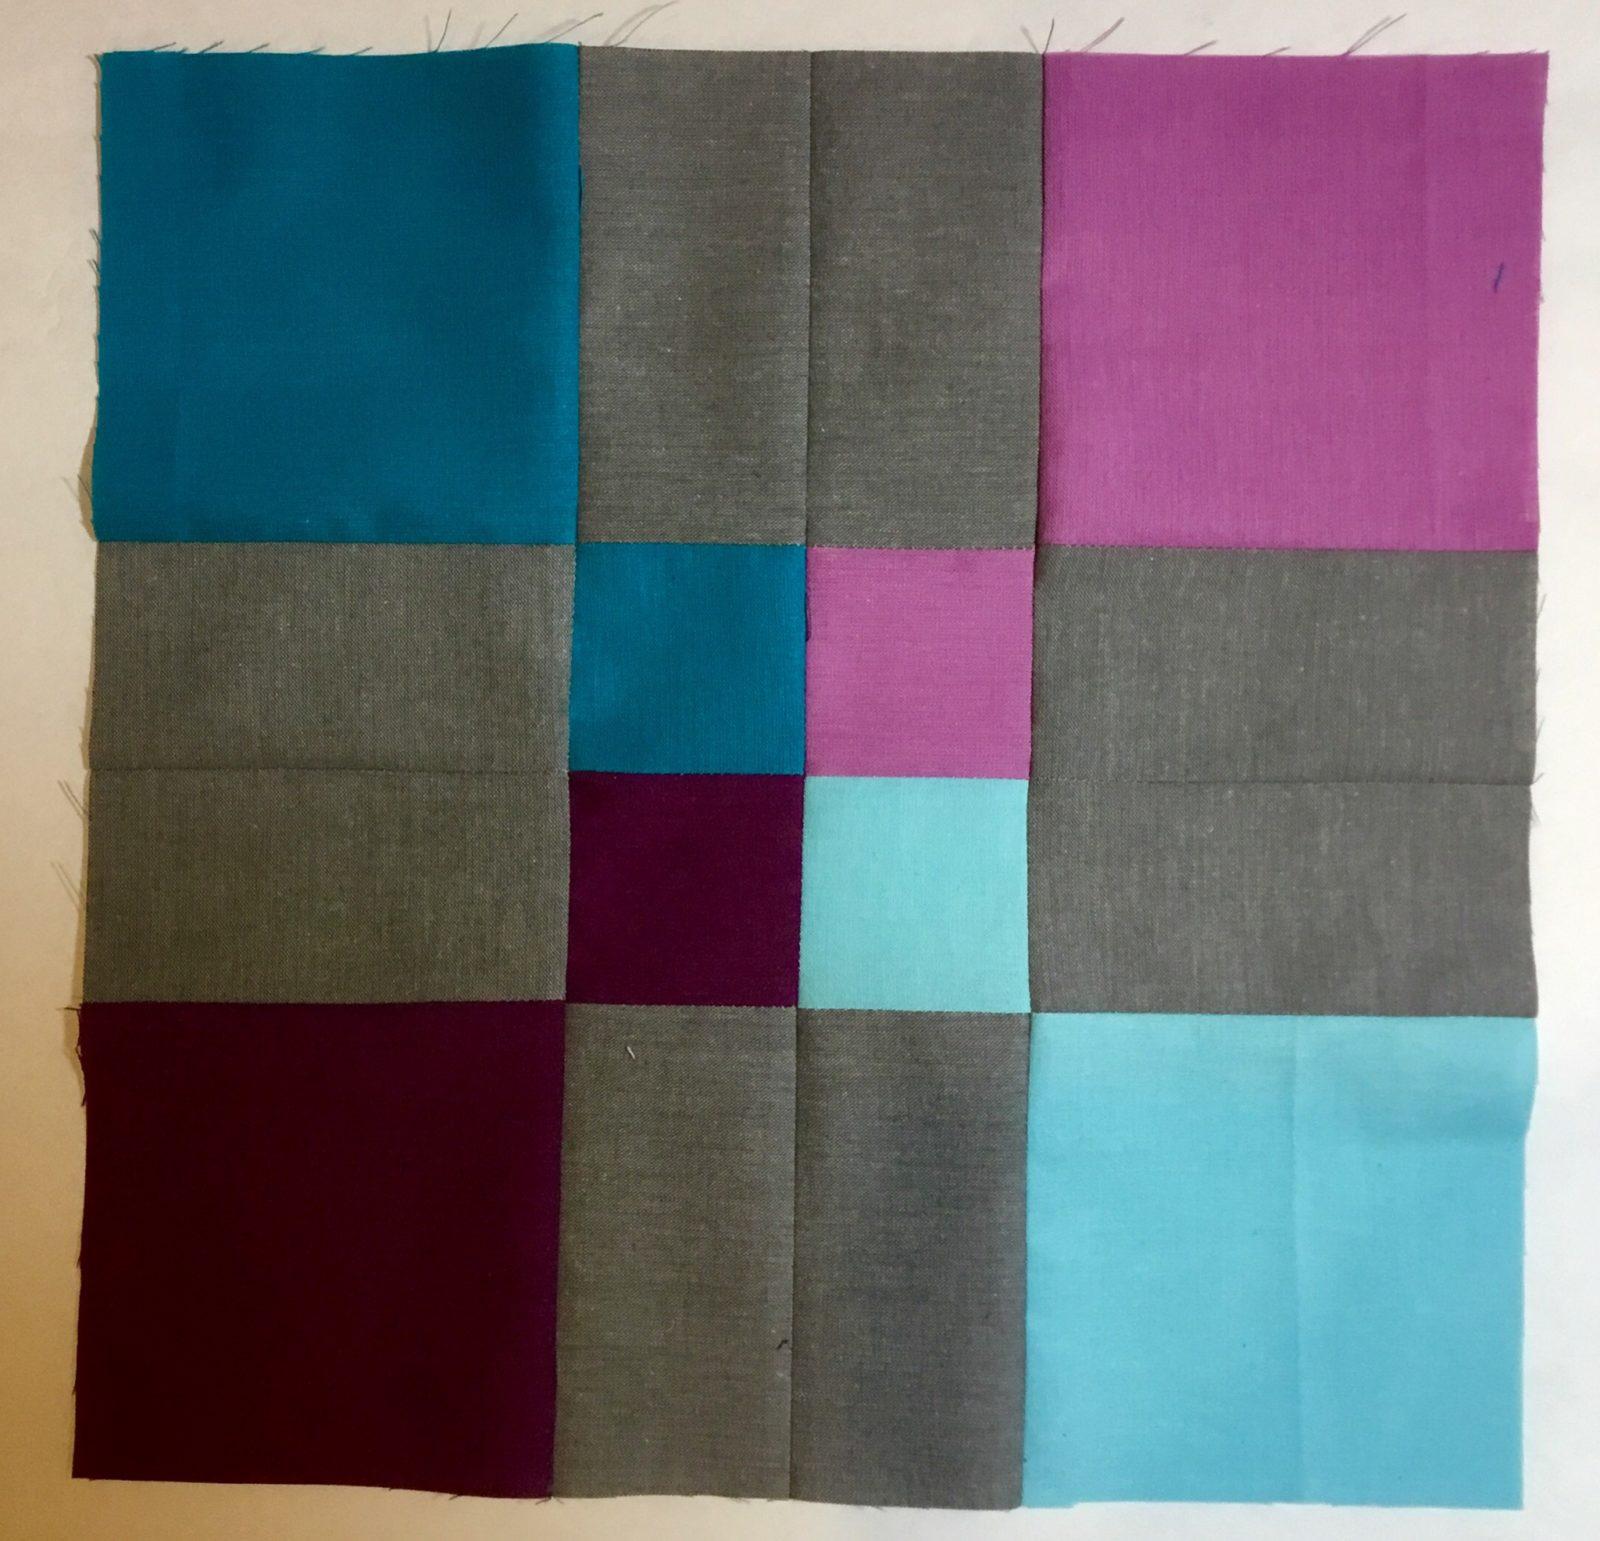 Four Square in a Nine Path Modern Block Cloud9 Cirrus Solids